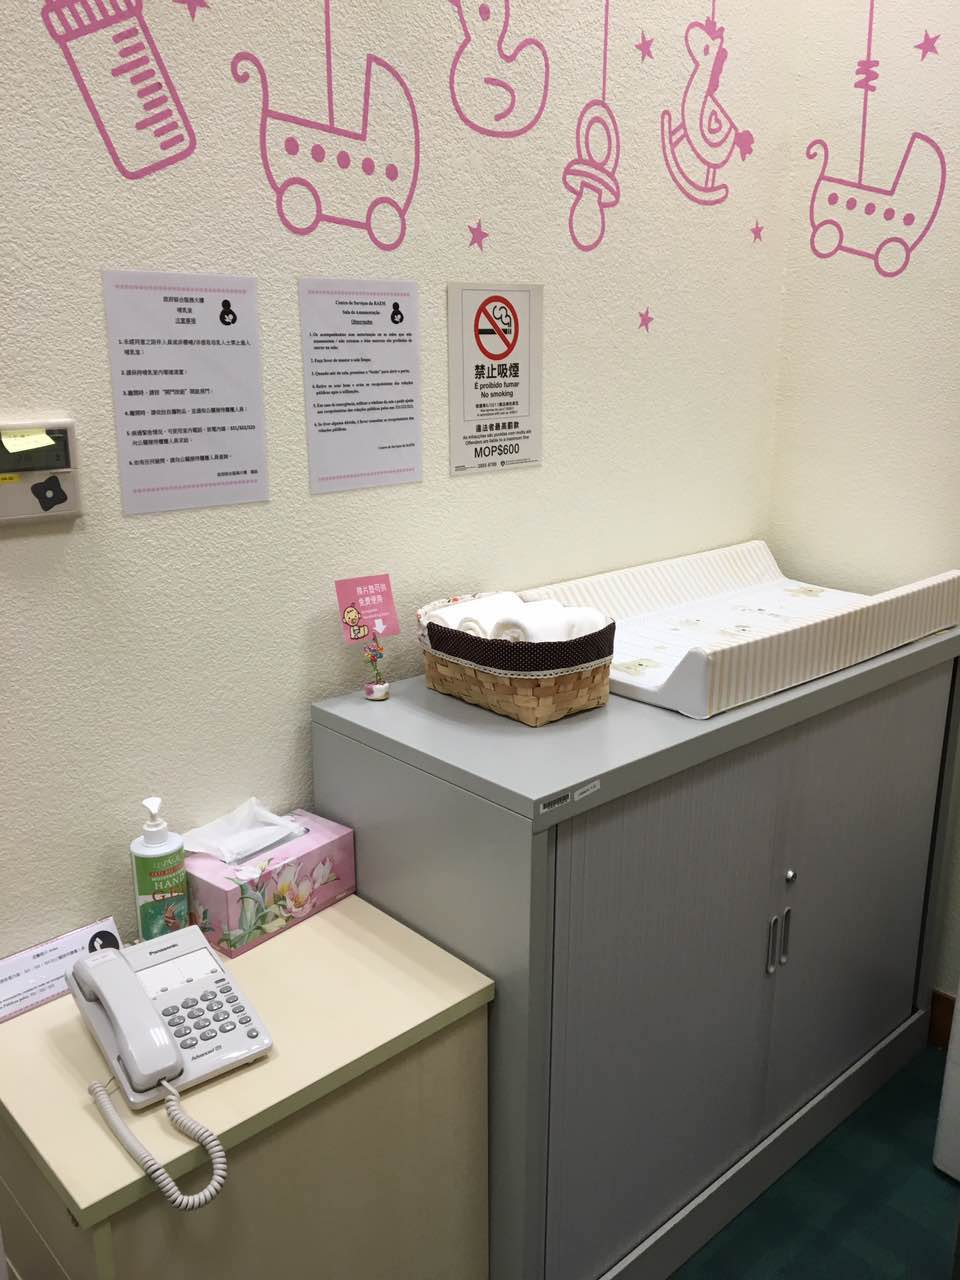 社諮委倡增加本澳母乳餵哺室